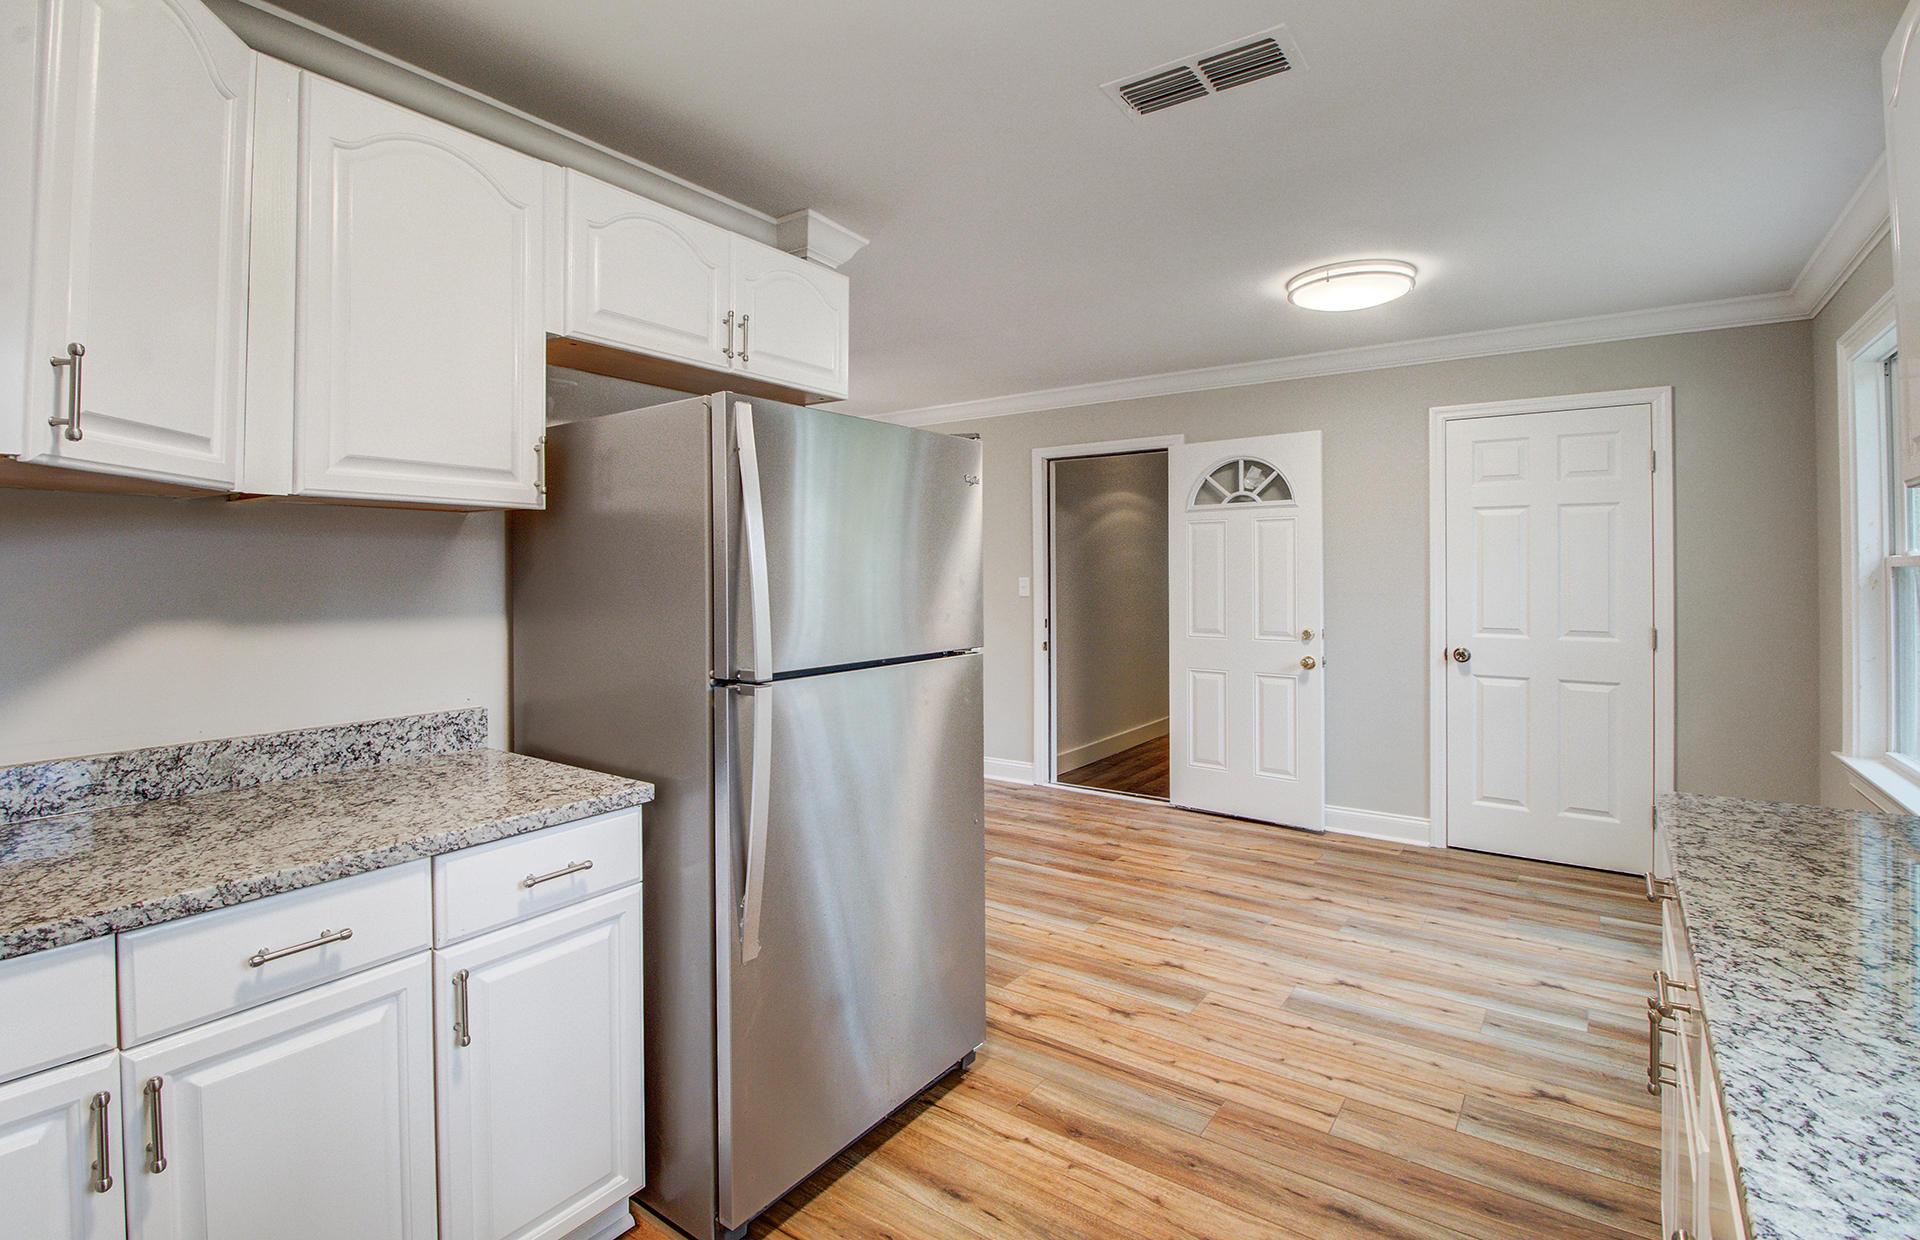 Sedgefield Section I Homes For Sale - 30 Aldene, Goose Creek, SC - 25